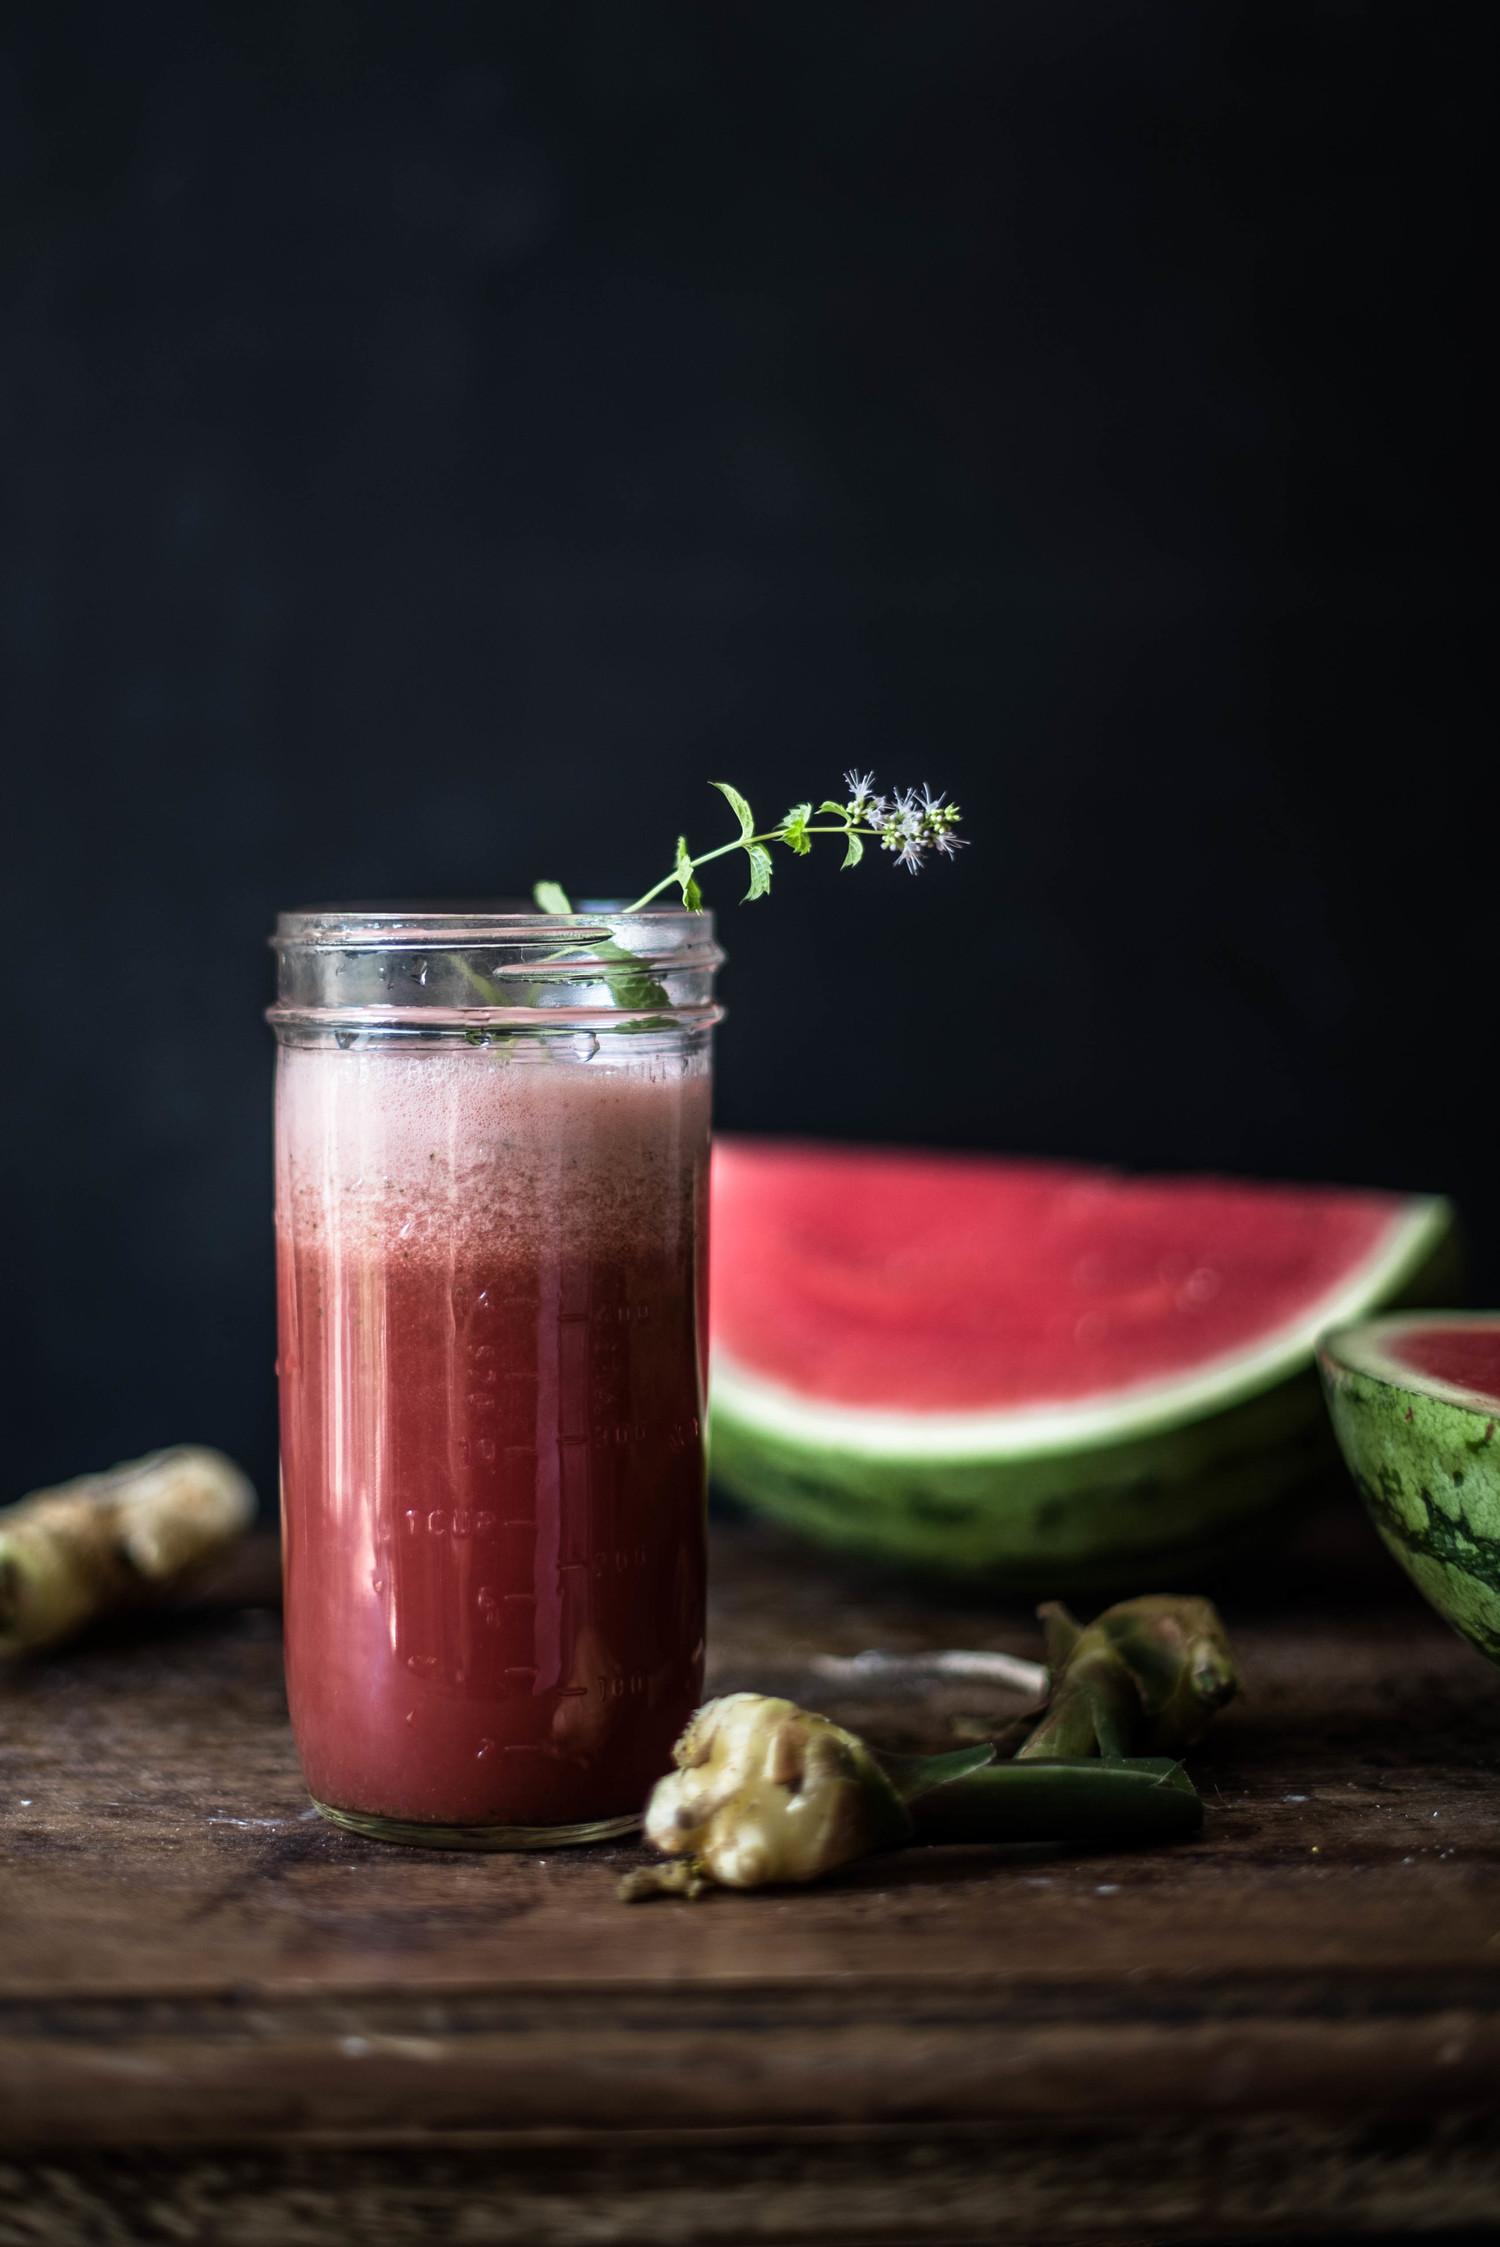 ROSE+&+IVY+Journal+A+Taste+of+Summer+Watermelon+&+Ginger+Juice.jpeg